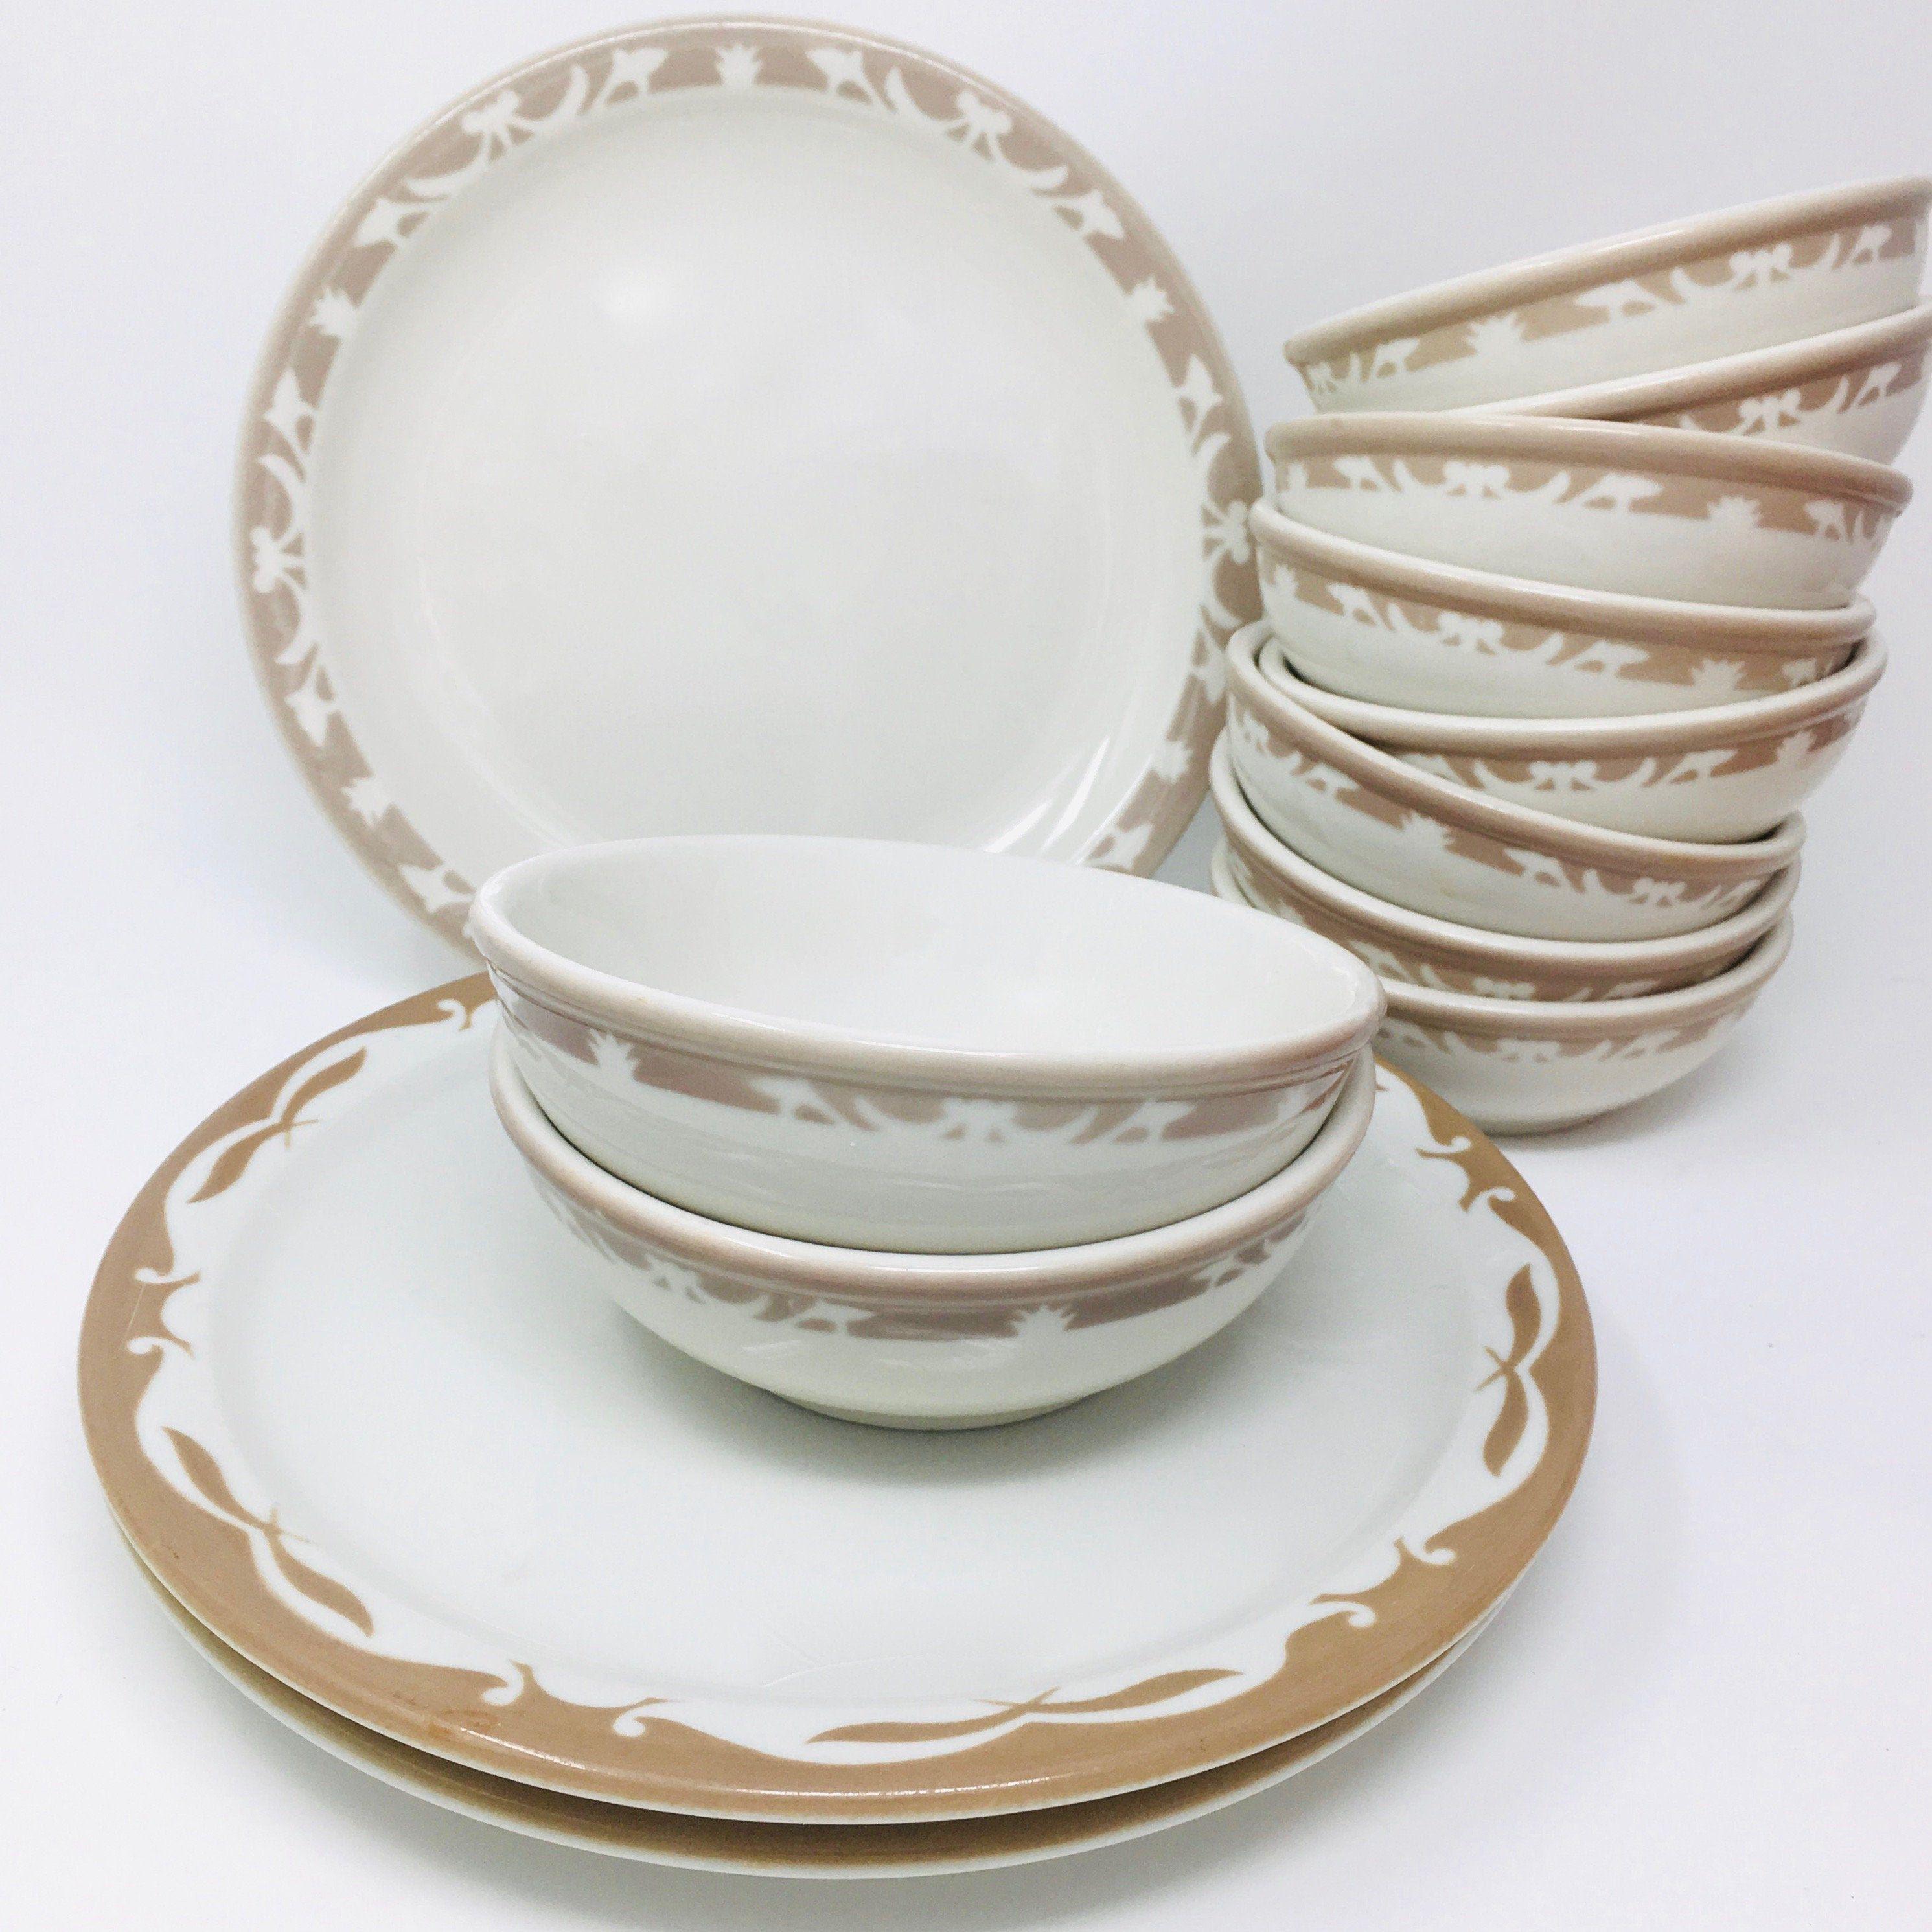 Syracuse China, Nutmeg, Set Of Four Bowls, Cereal Or Ice